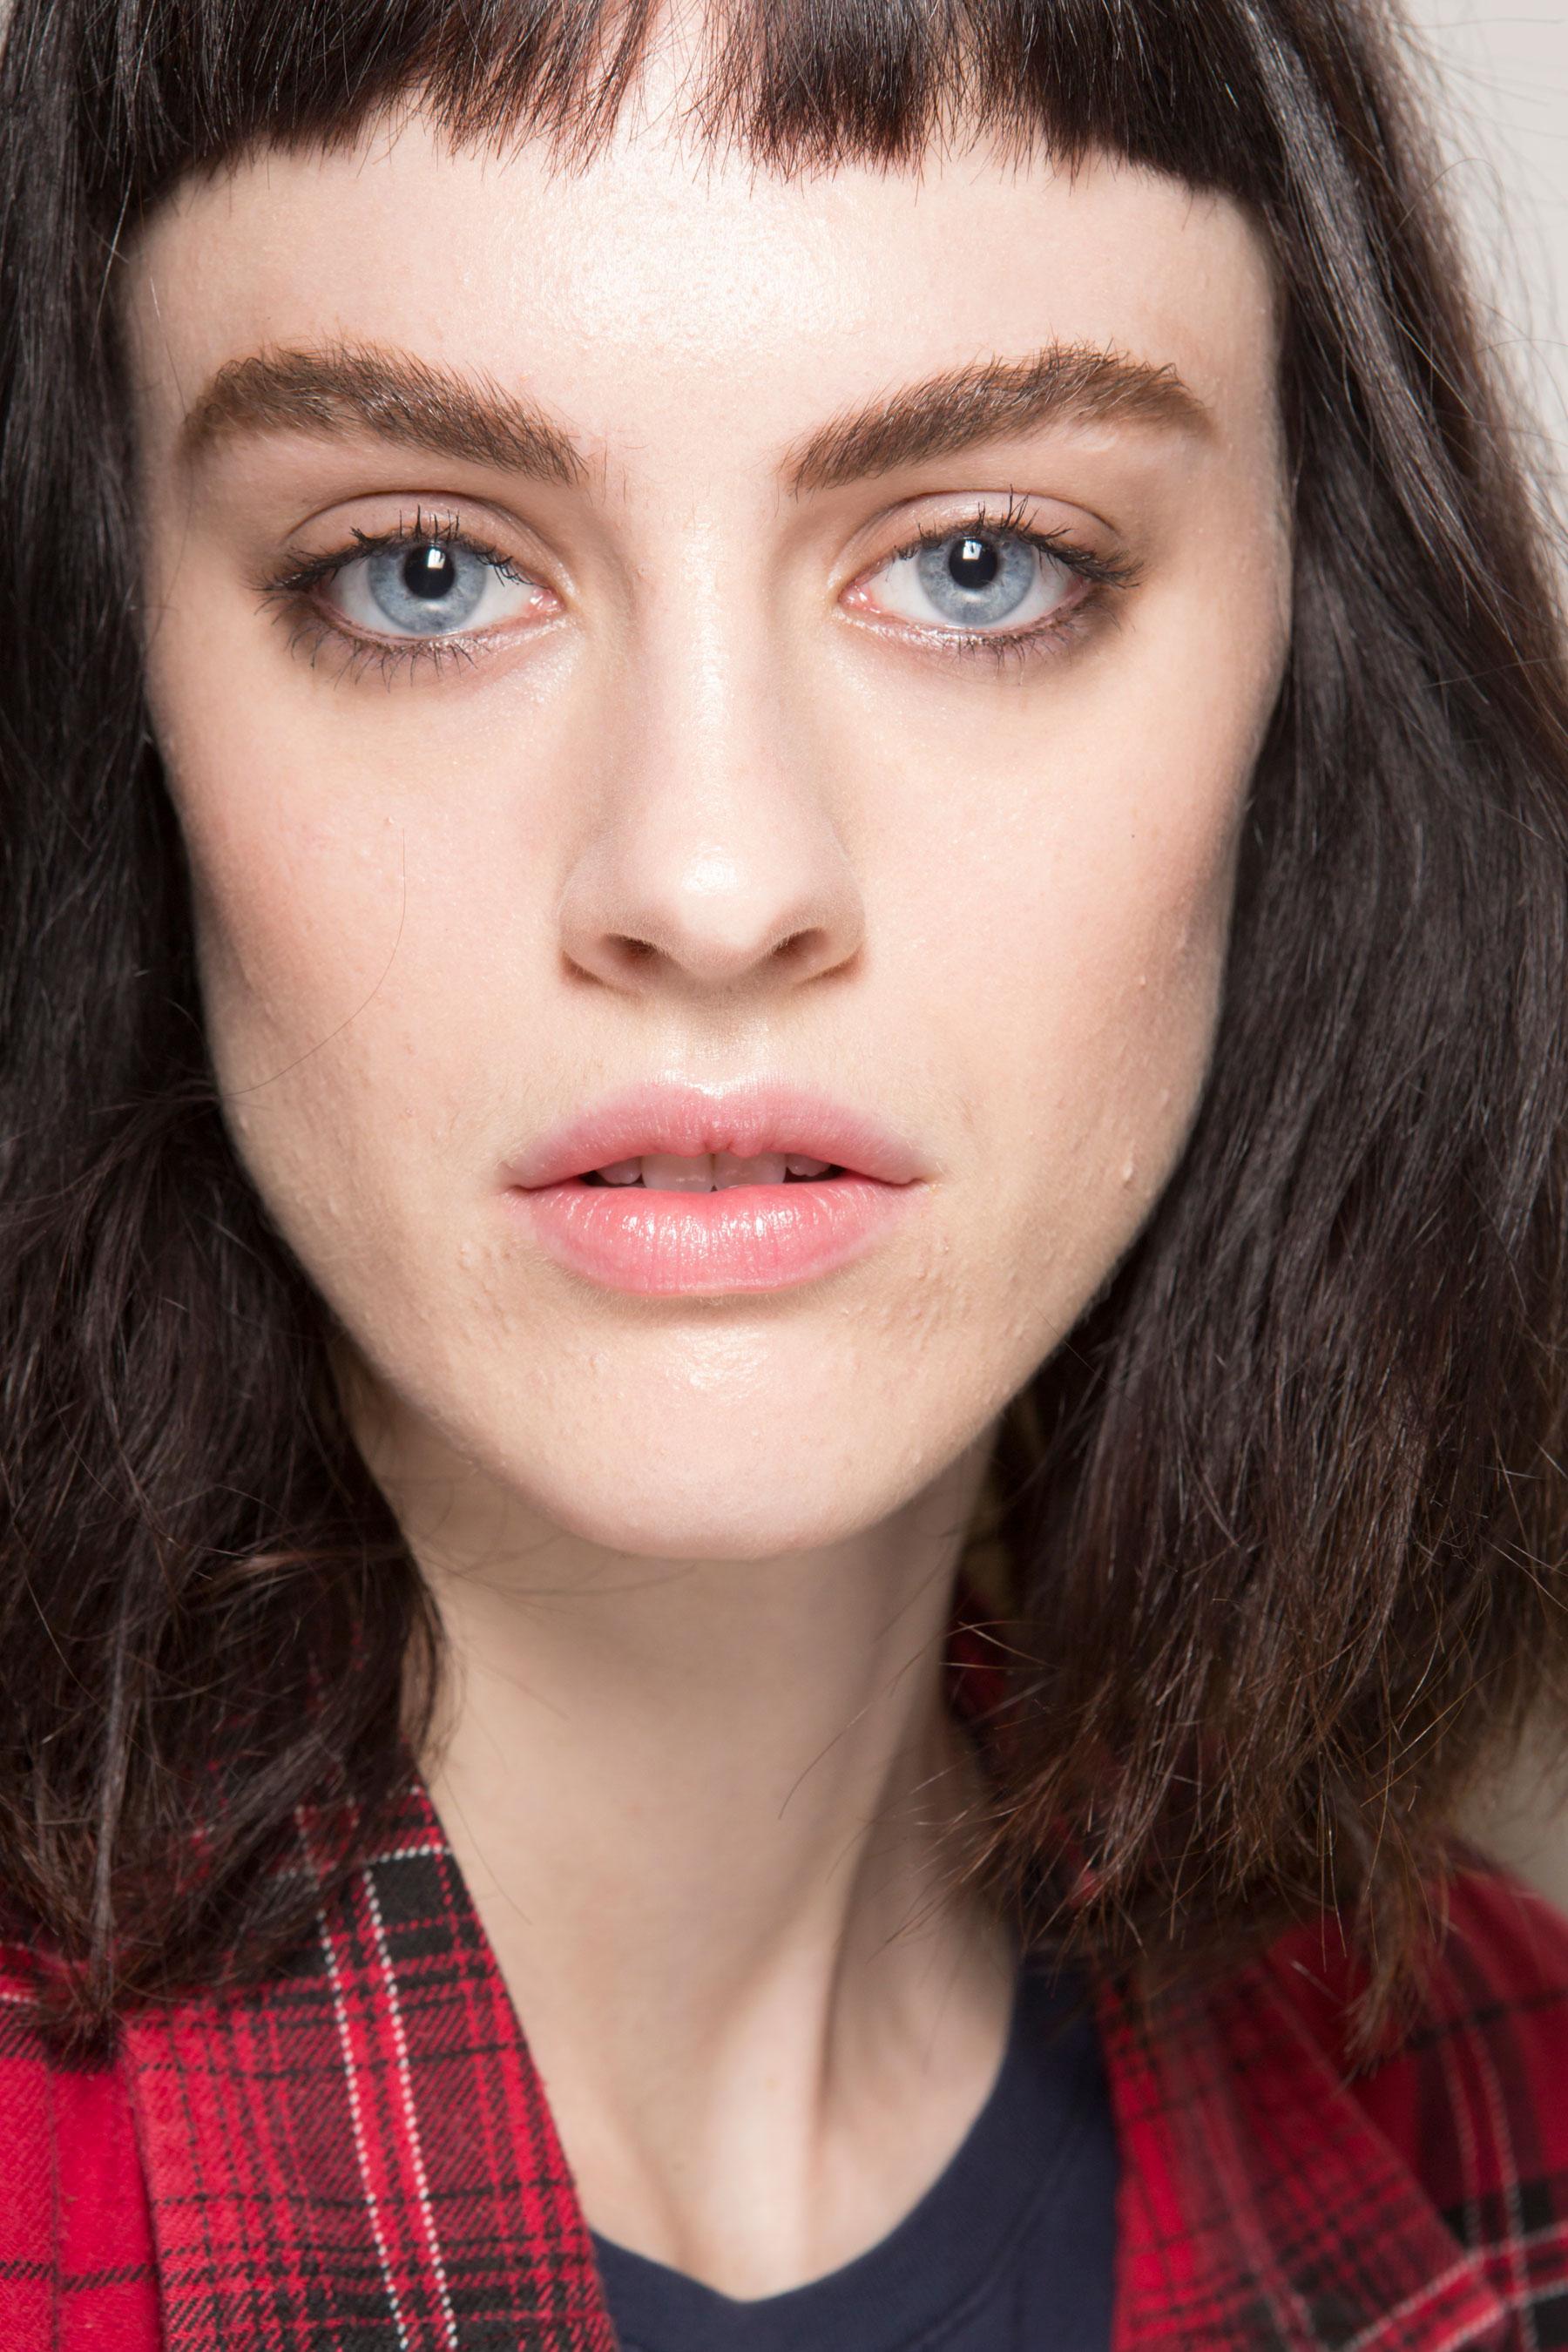 Roberto-Cavalli-Backstage-beauty-spring-2016-close-up-fashion-show-the-impression-110